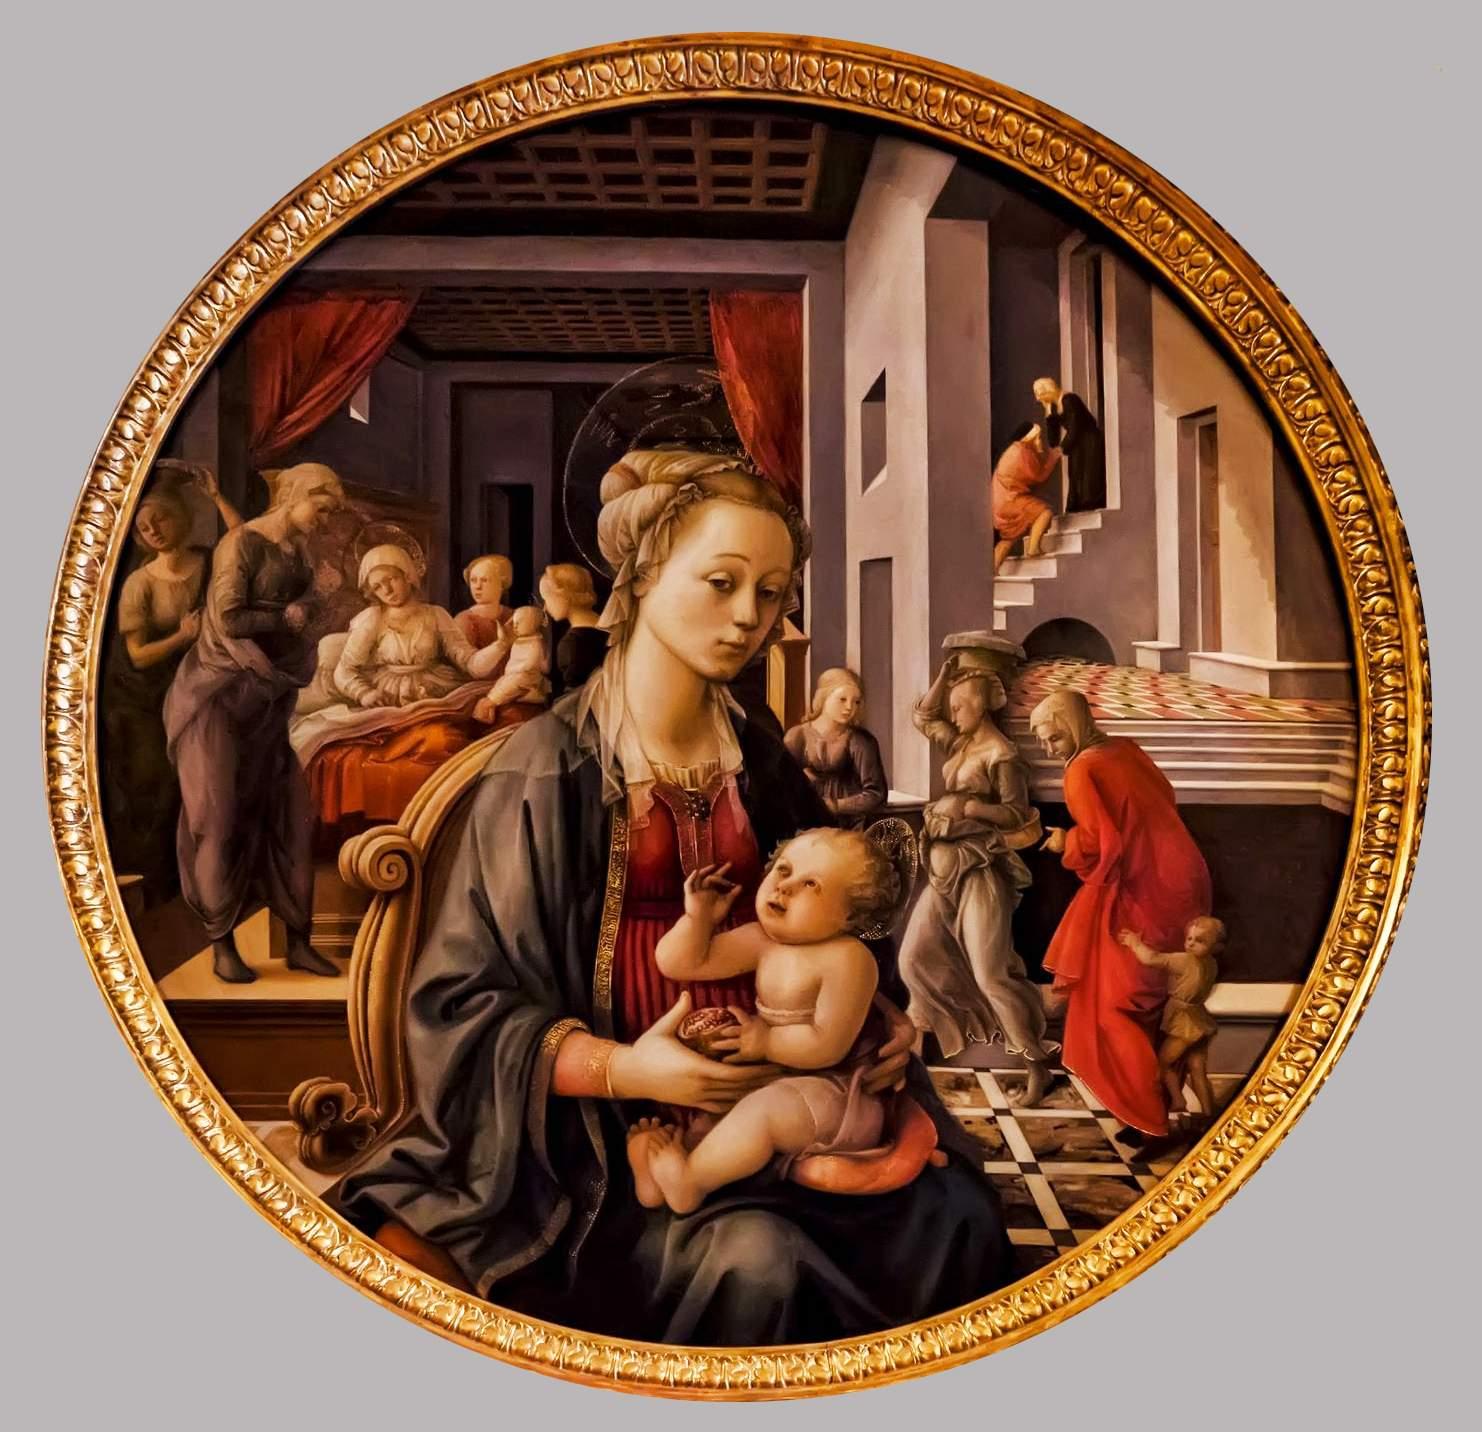 filippo-lippi-madonna-vierge-enfant-naissance-vierge-1452-huile-sur-bois-pitti-palatina-florence-italie-01 - Copie - Copie-1